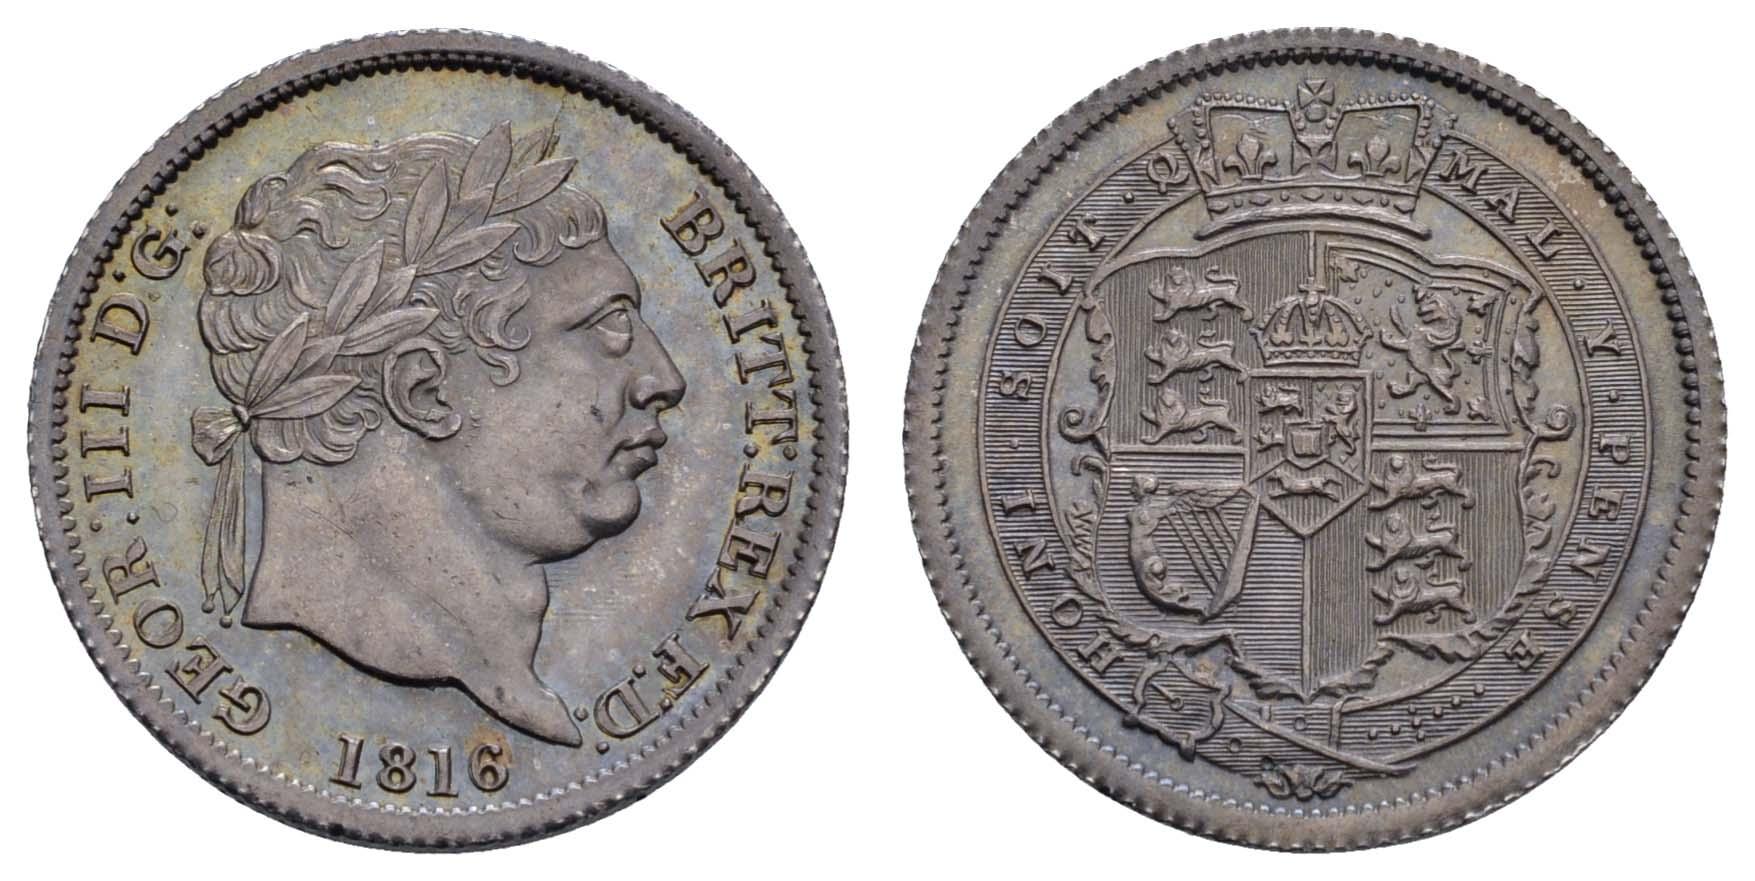 Lot 1563 - europa ab 1800 - Großbritannien -  Auktionshaus Ulrich Felzmann GmbH & Co. KG Coins single lots